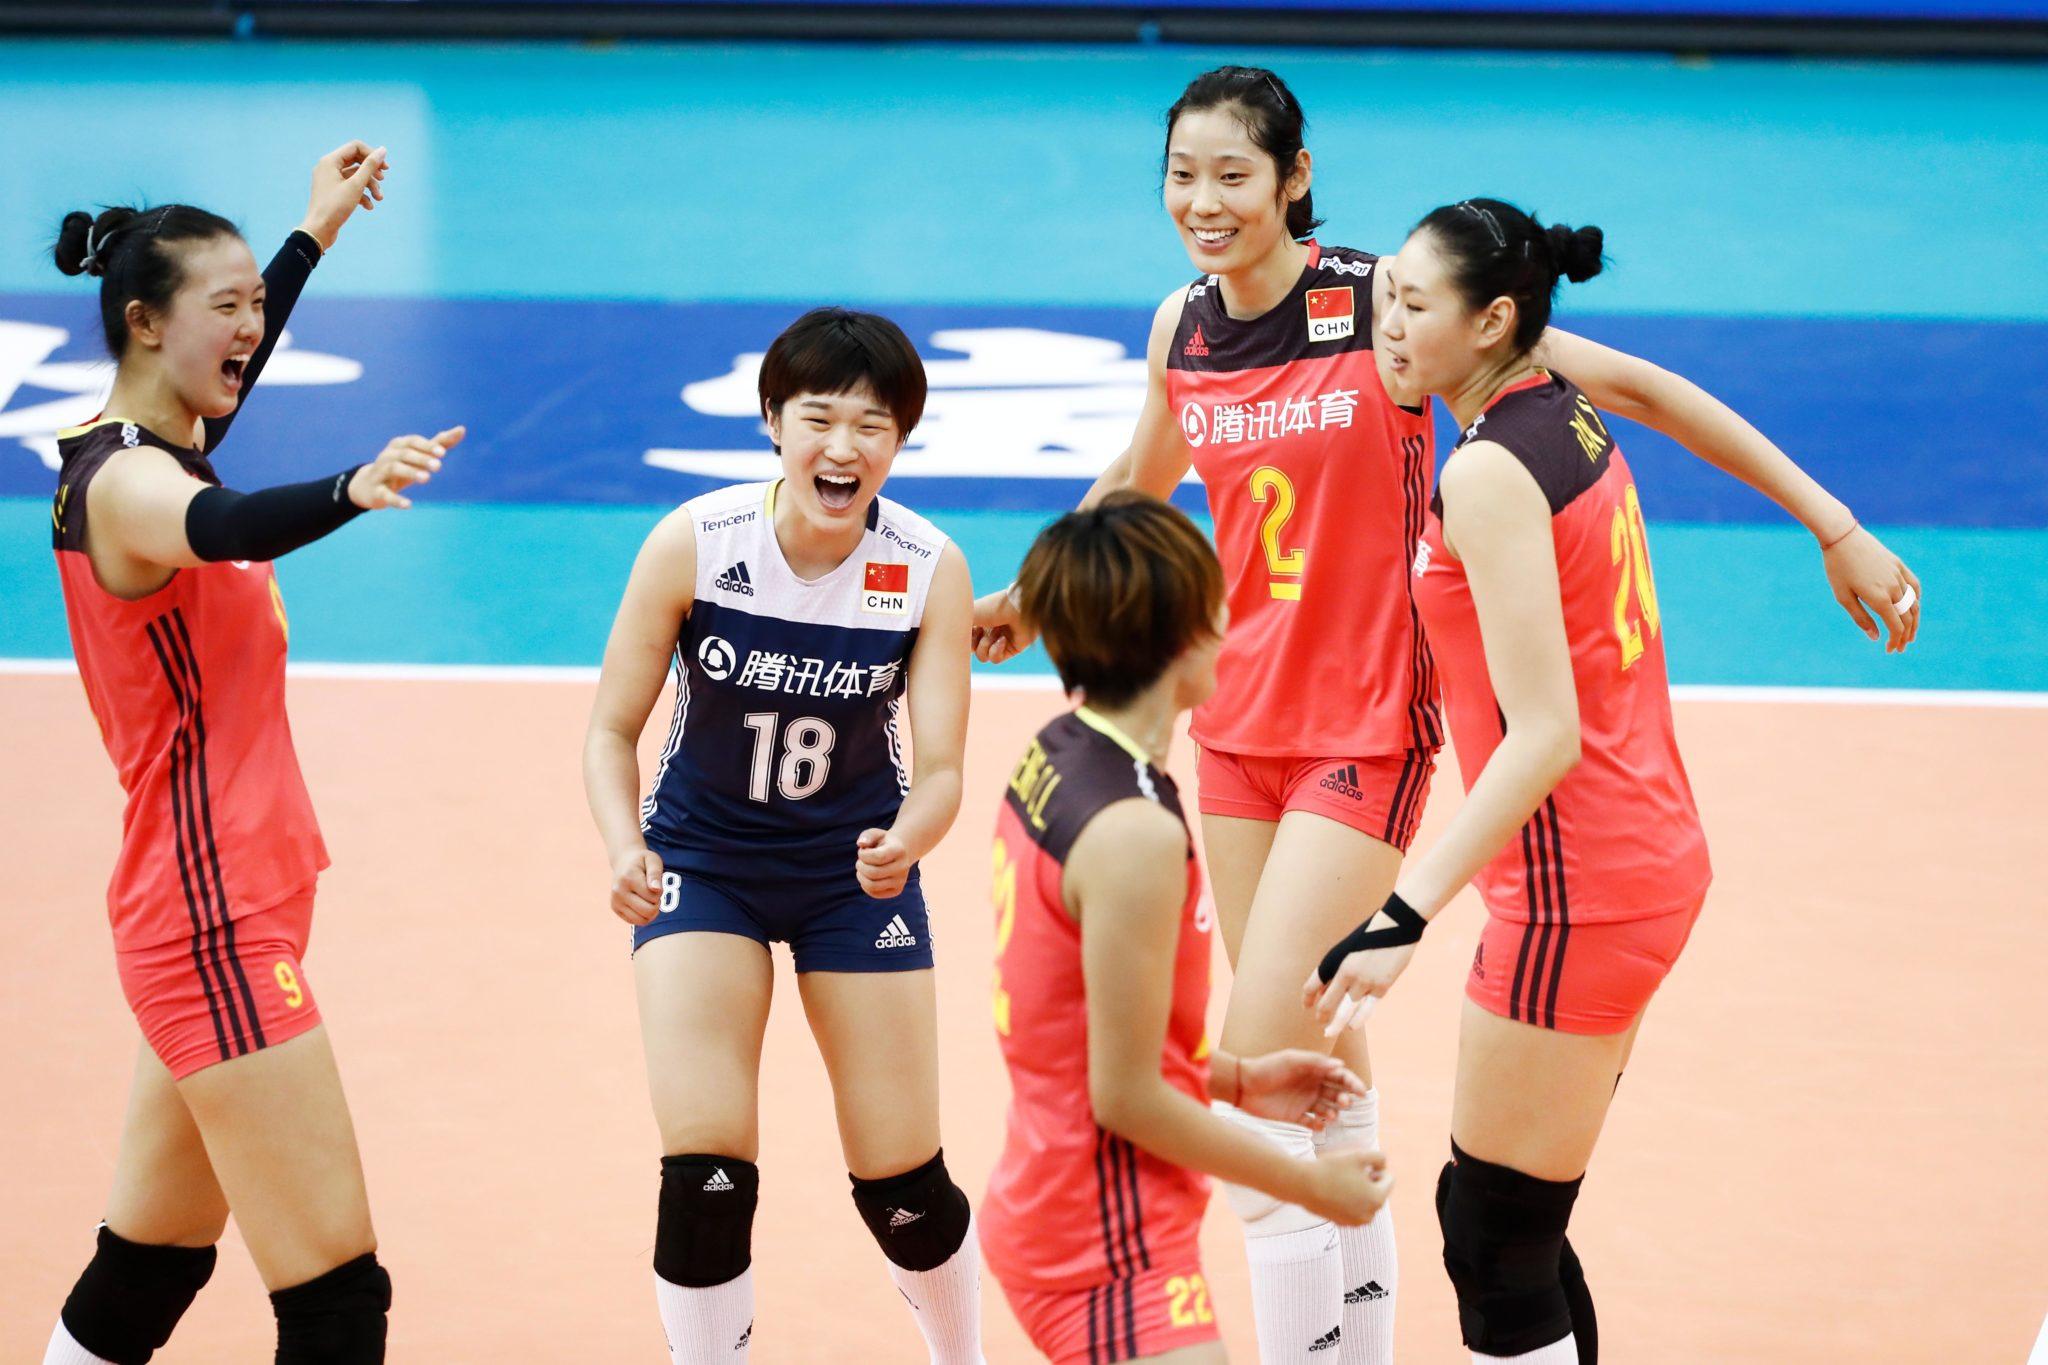 Nanjing, China To Host Inaugural Women's Nations League Finals